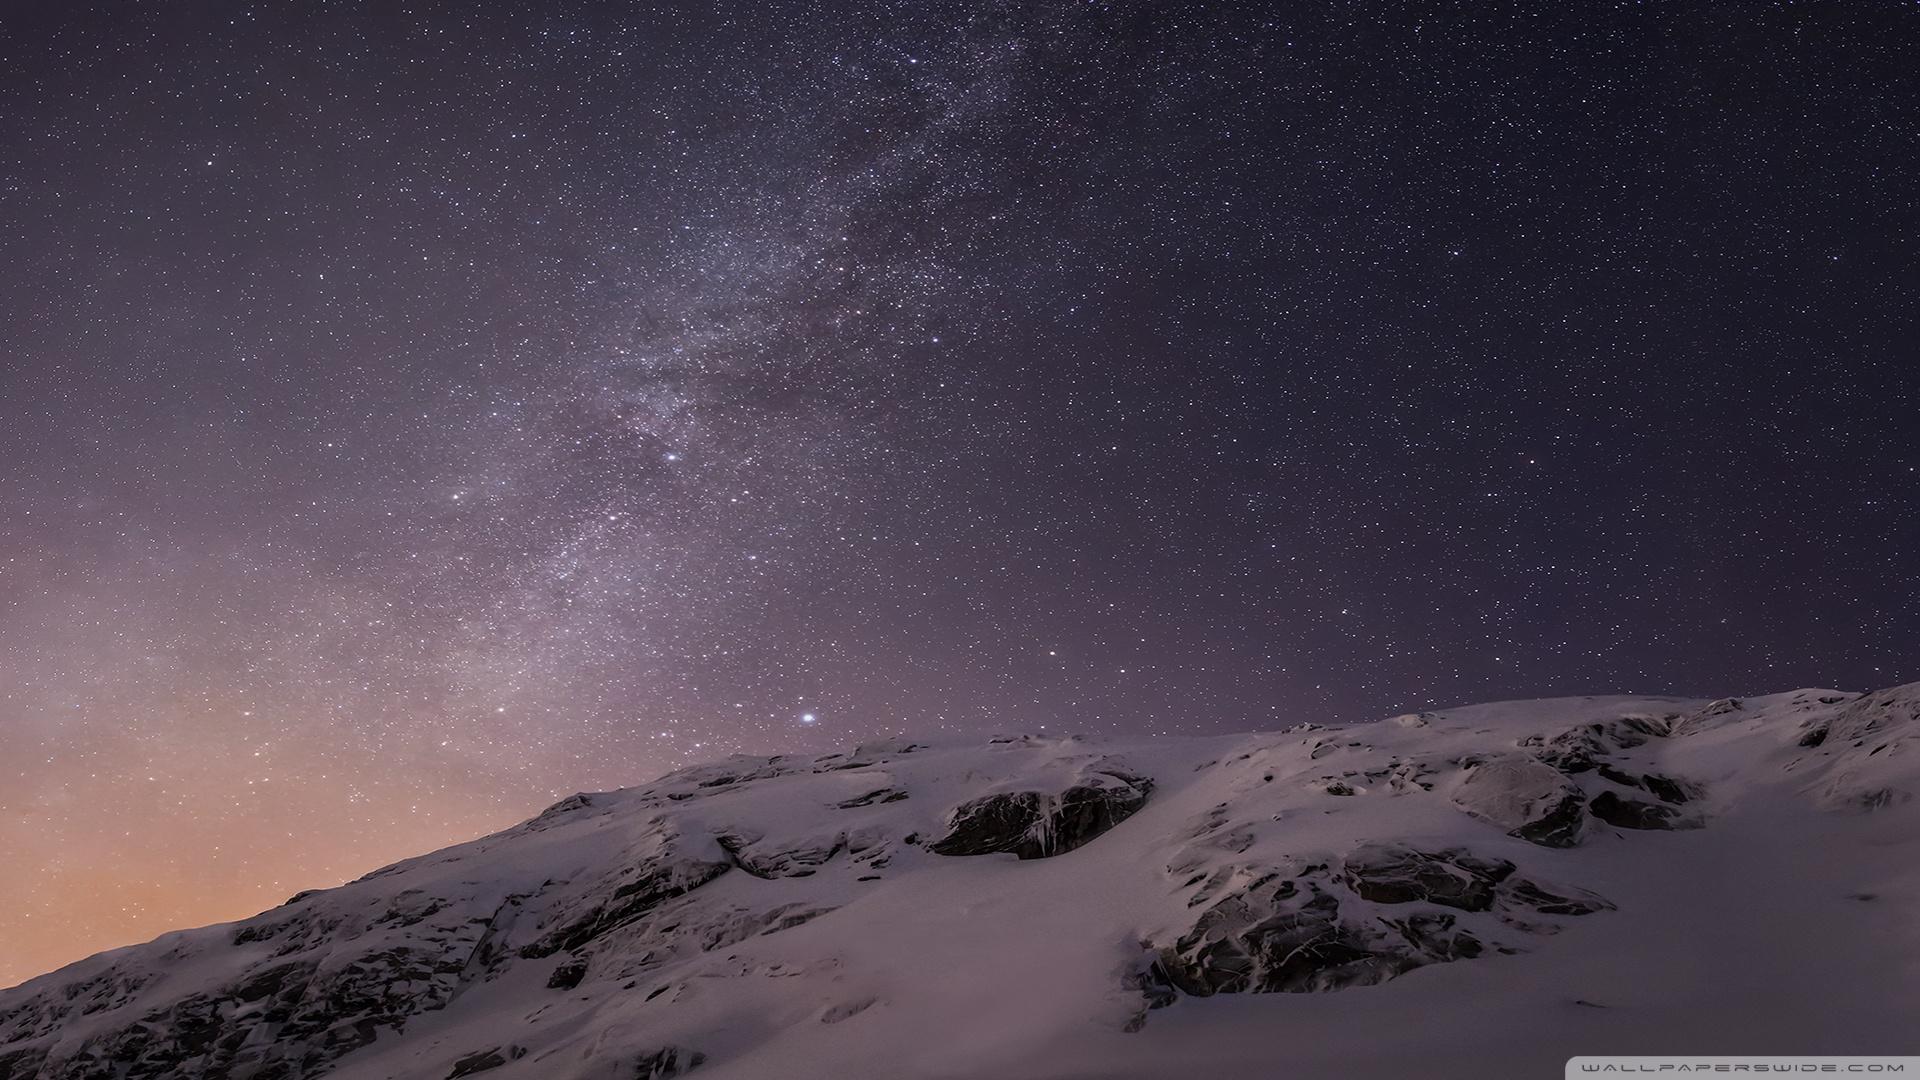 Apple iOS Mountains and Galaxy HD desktop wallpaper : Widescreen